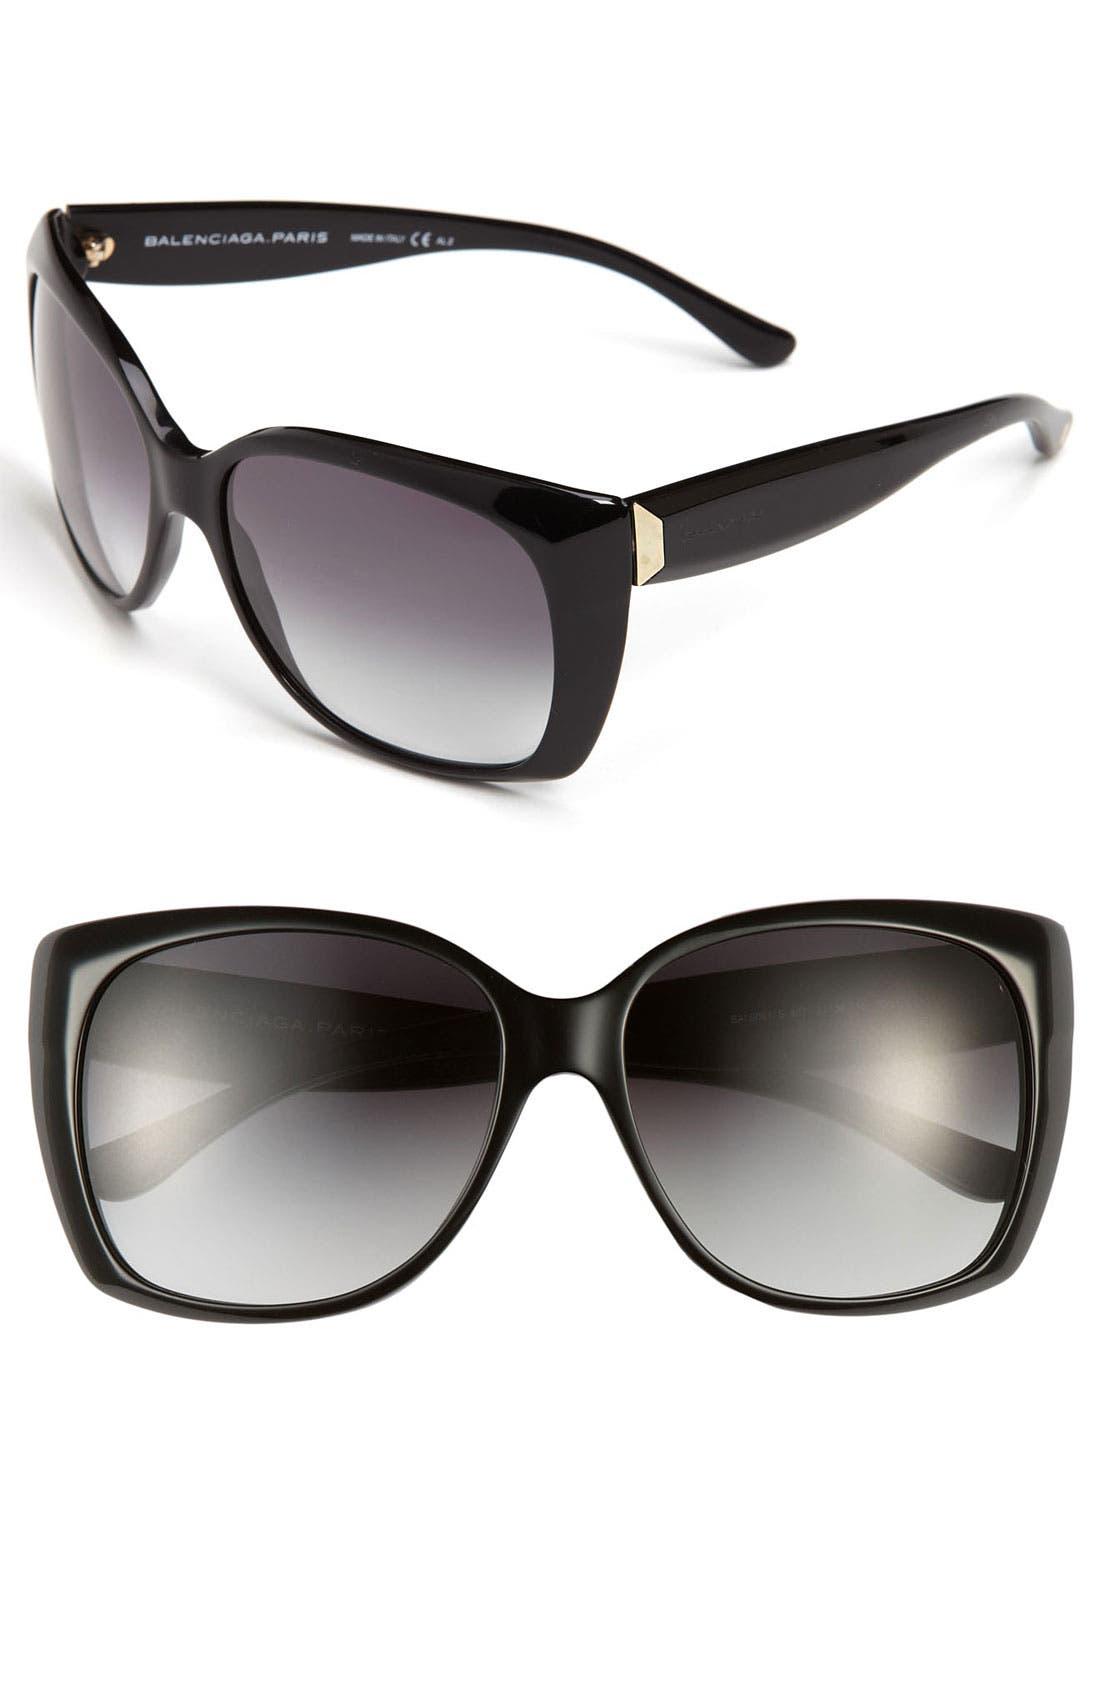 Main Image - Balenciaga Paris Cat's Eye Sunglasses